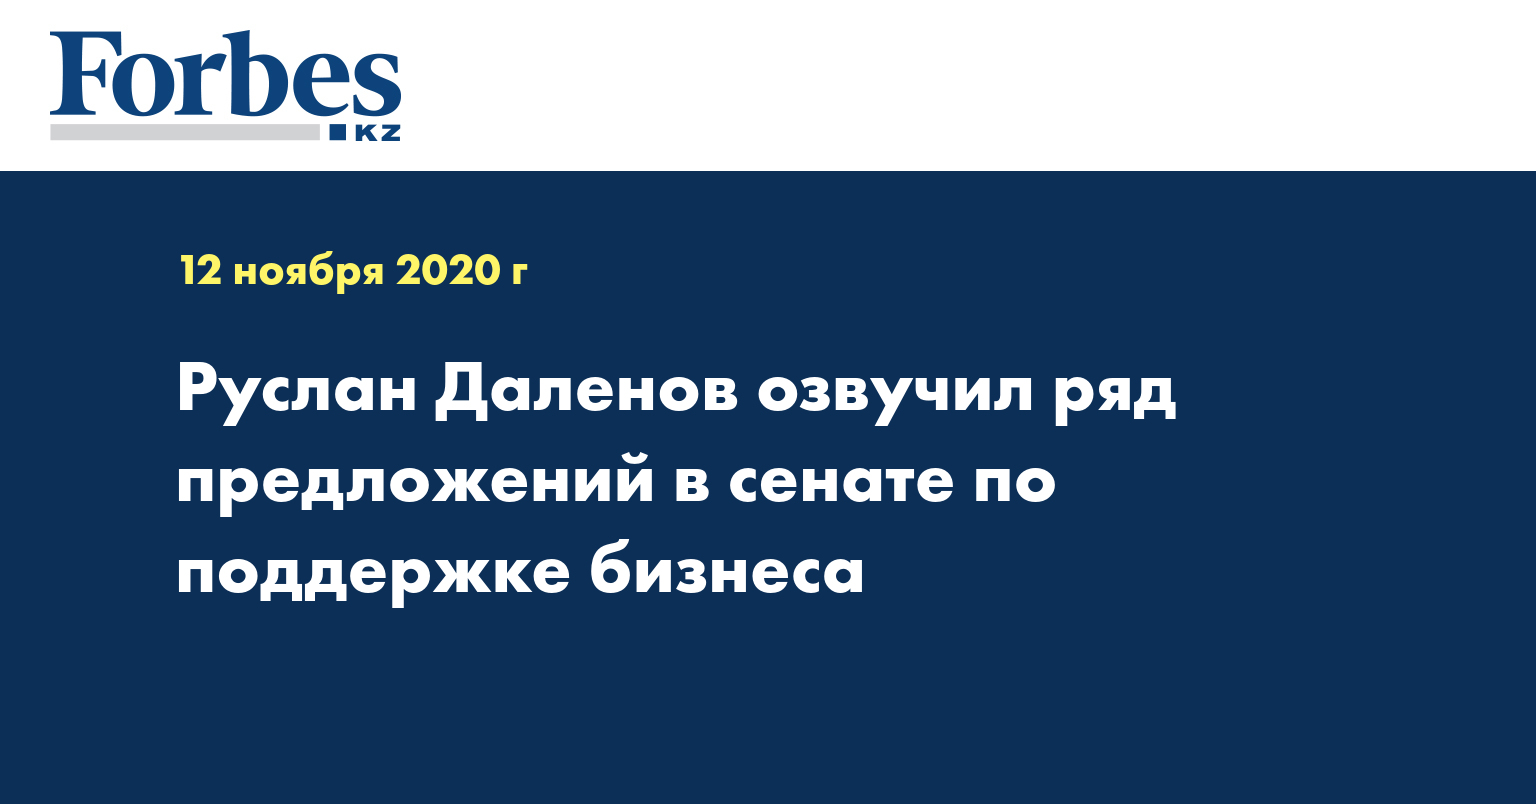 Руслан Даленов озвучил ряд предложений в сенате по поддержке бизнеса